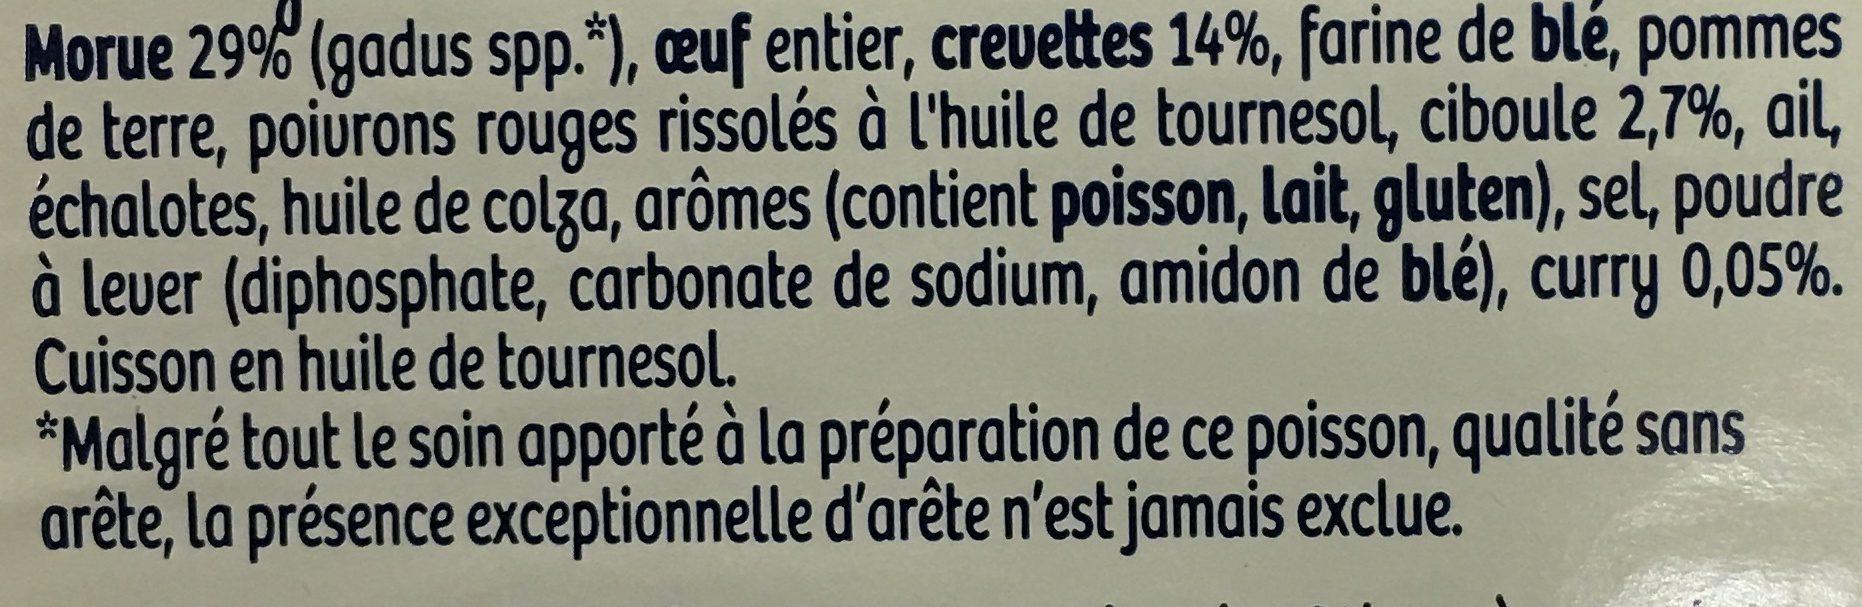 Barquette 200g acras crevettes - Ingrediënten - fr